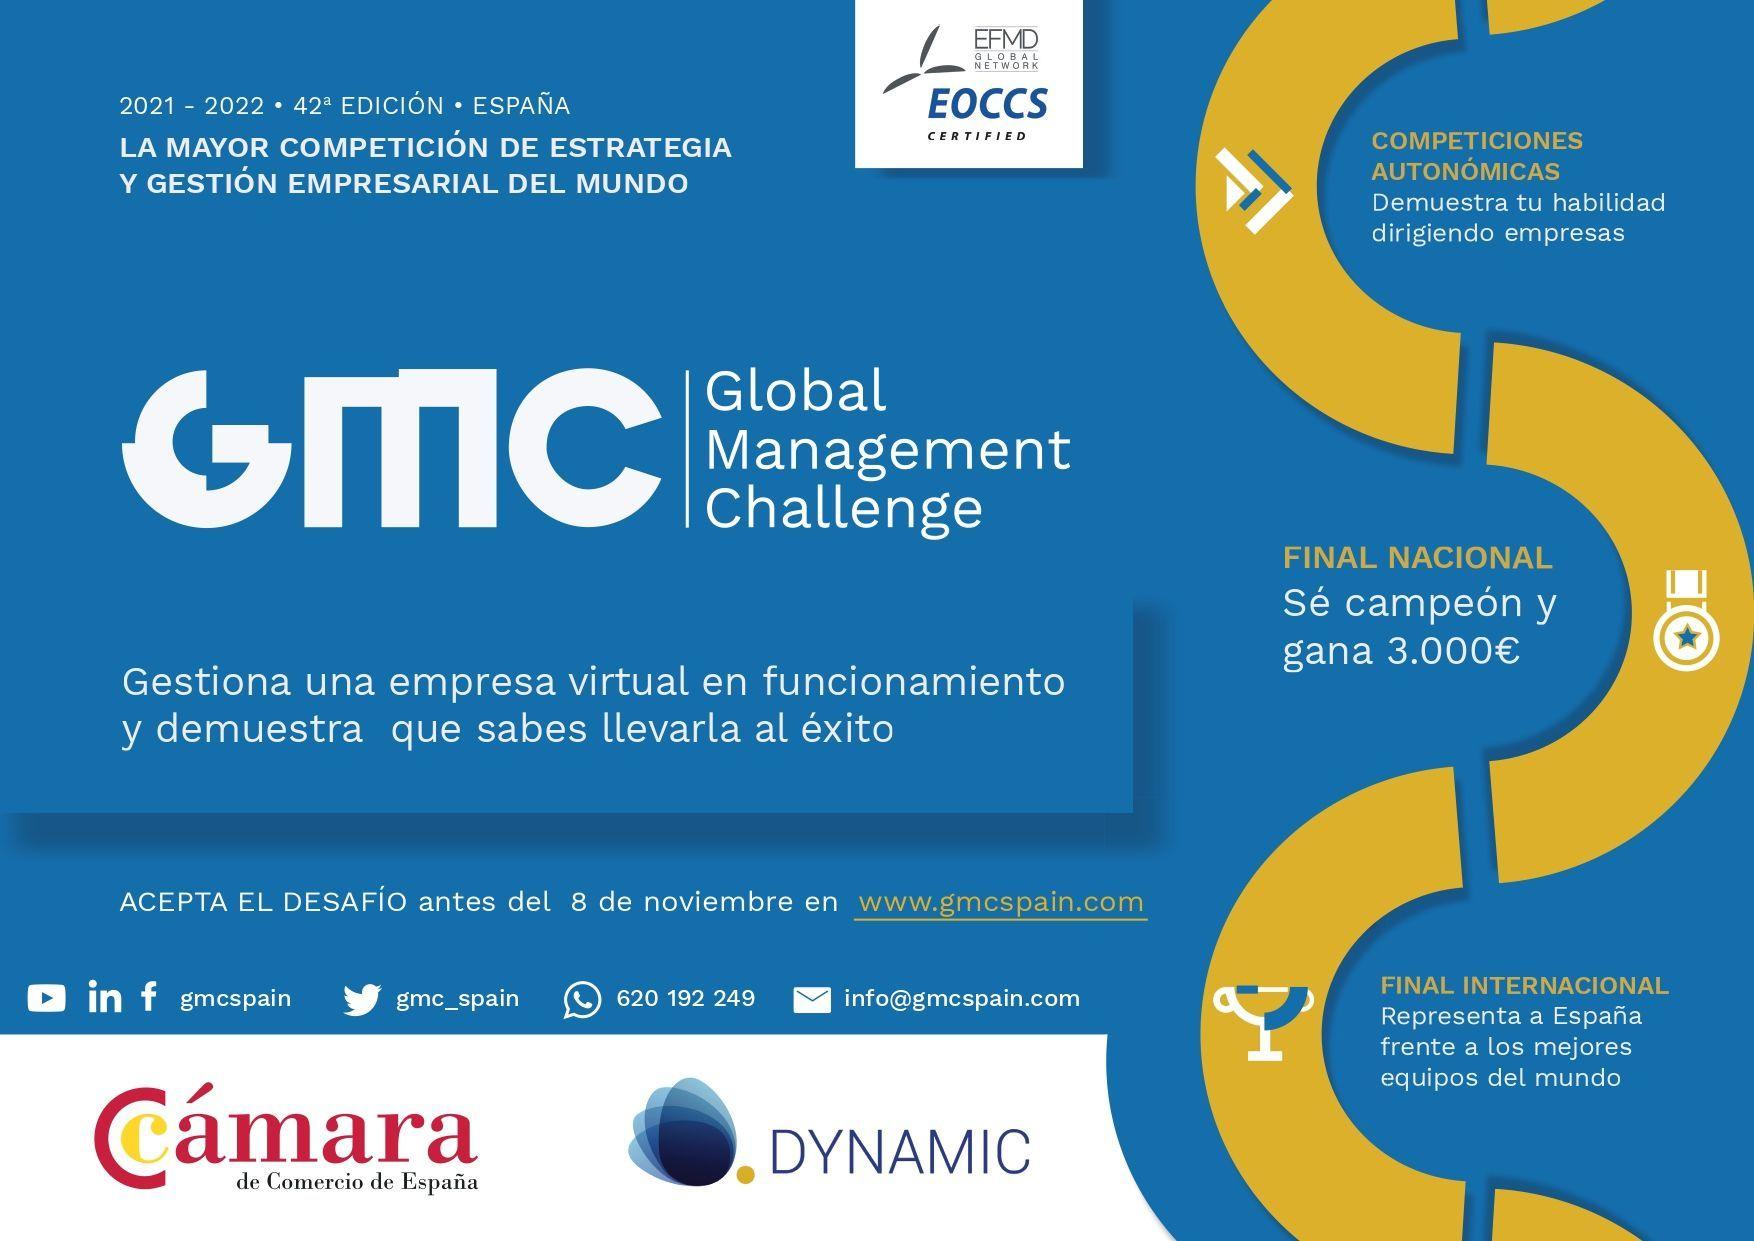 GLOBAL MANAGEMENT CHALLENGE 2021-2022